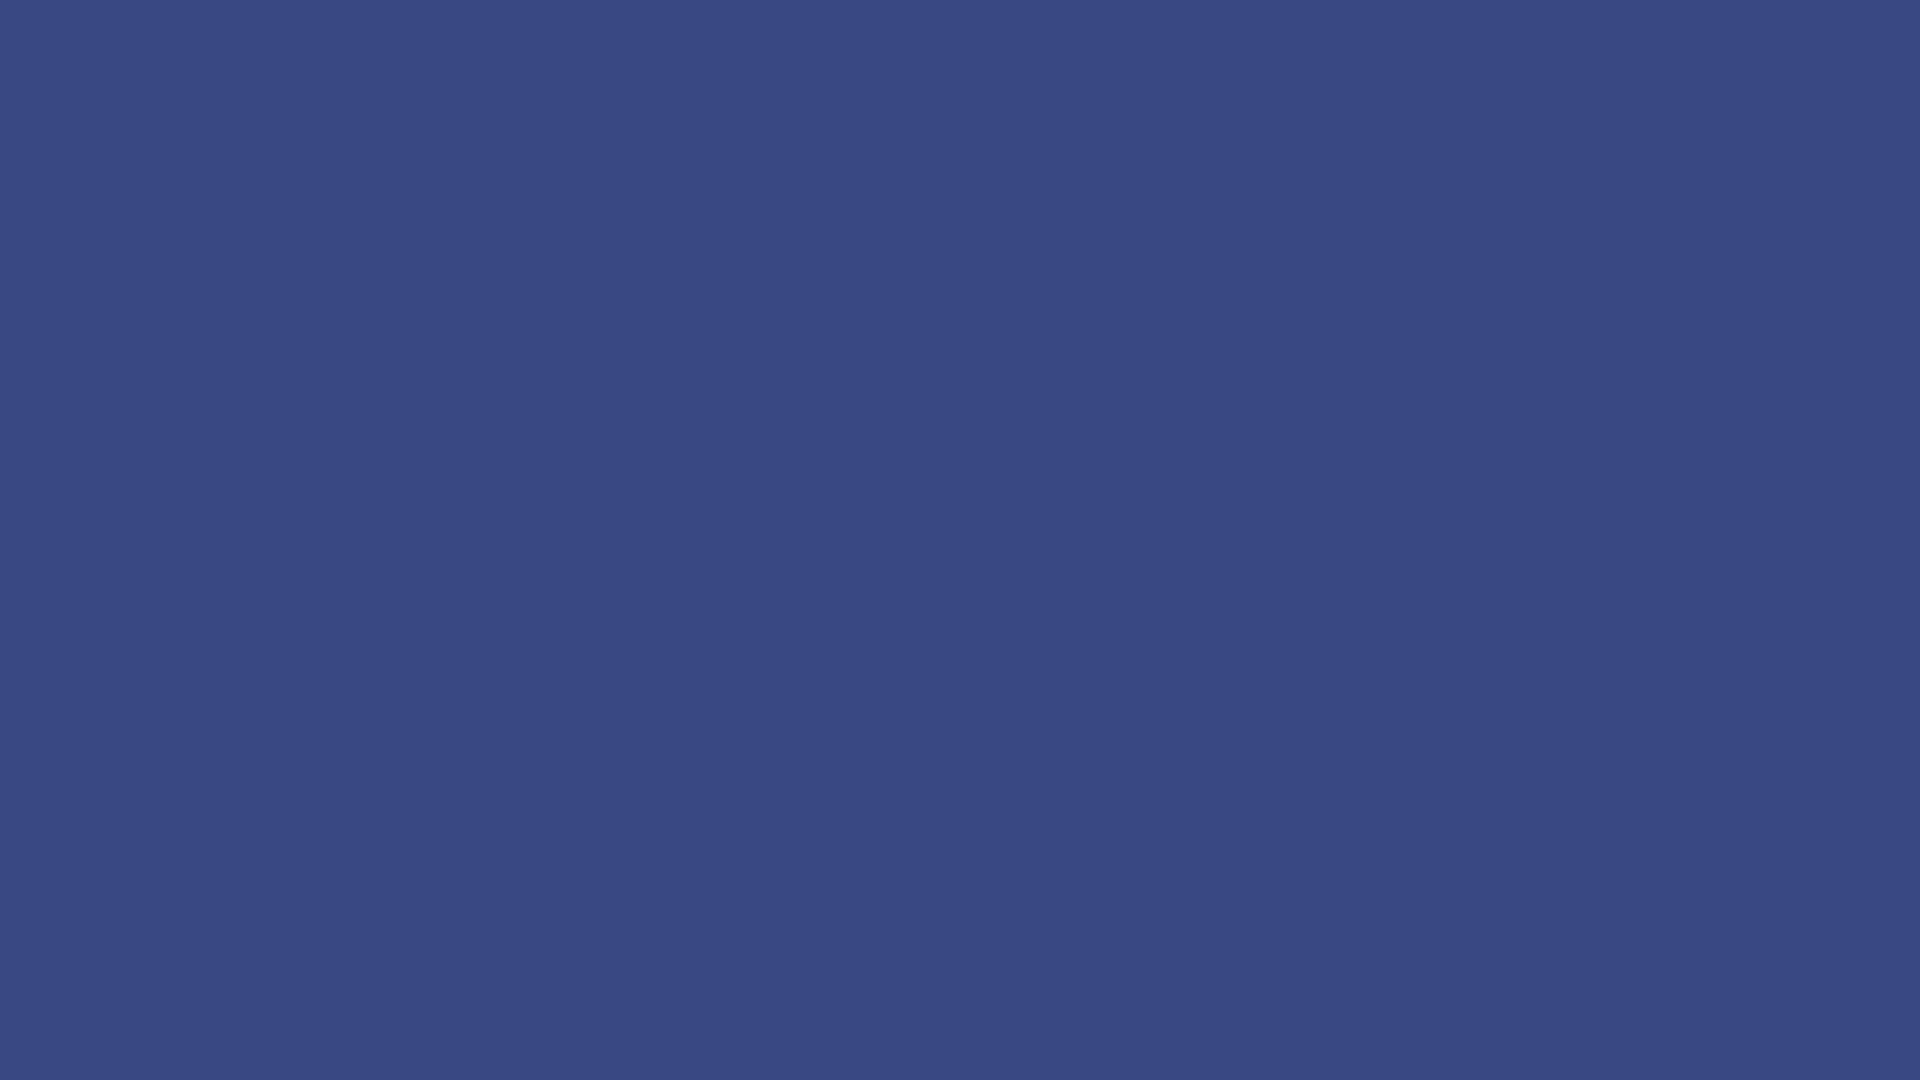 ssc-web-blue-background